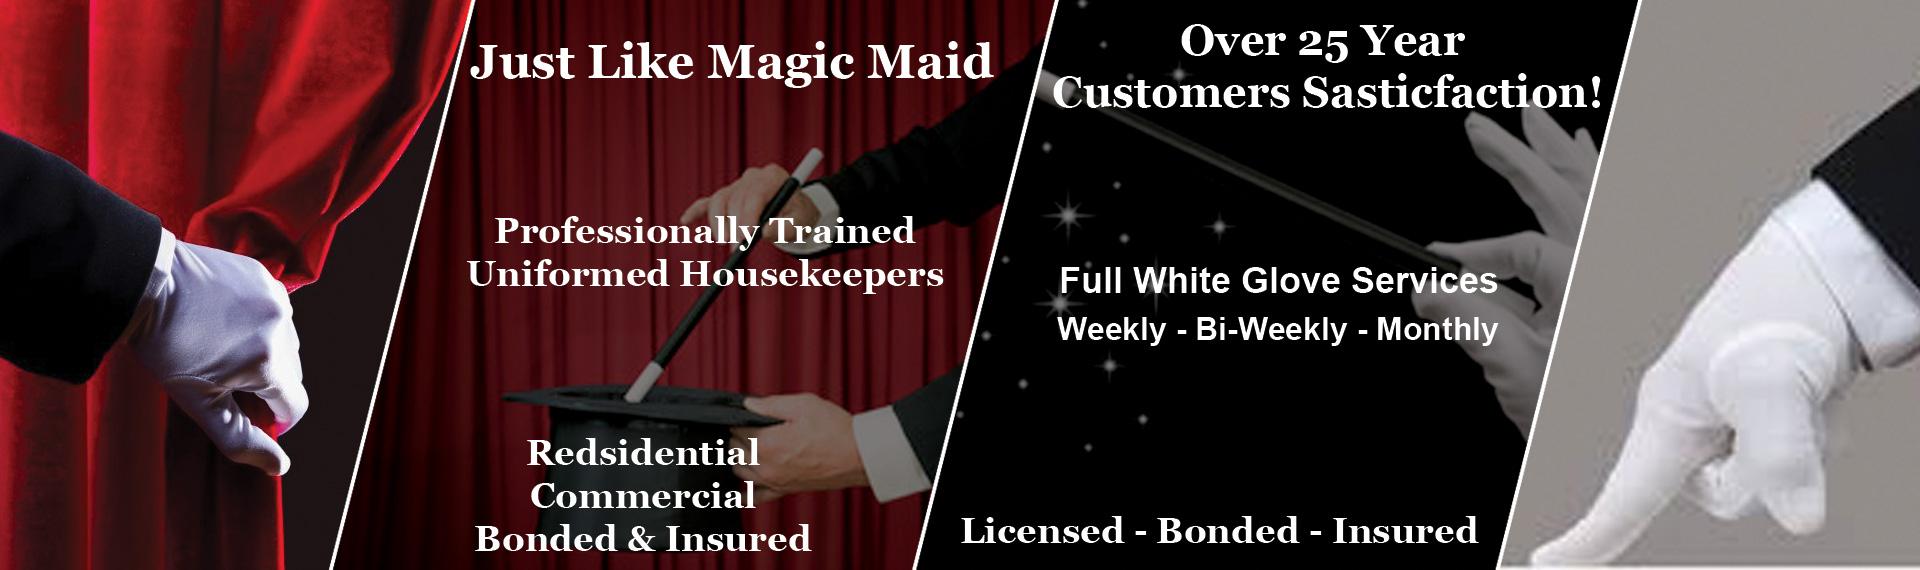 Just Like Magic Maids Laguna Beach CA